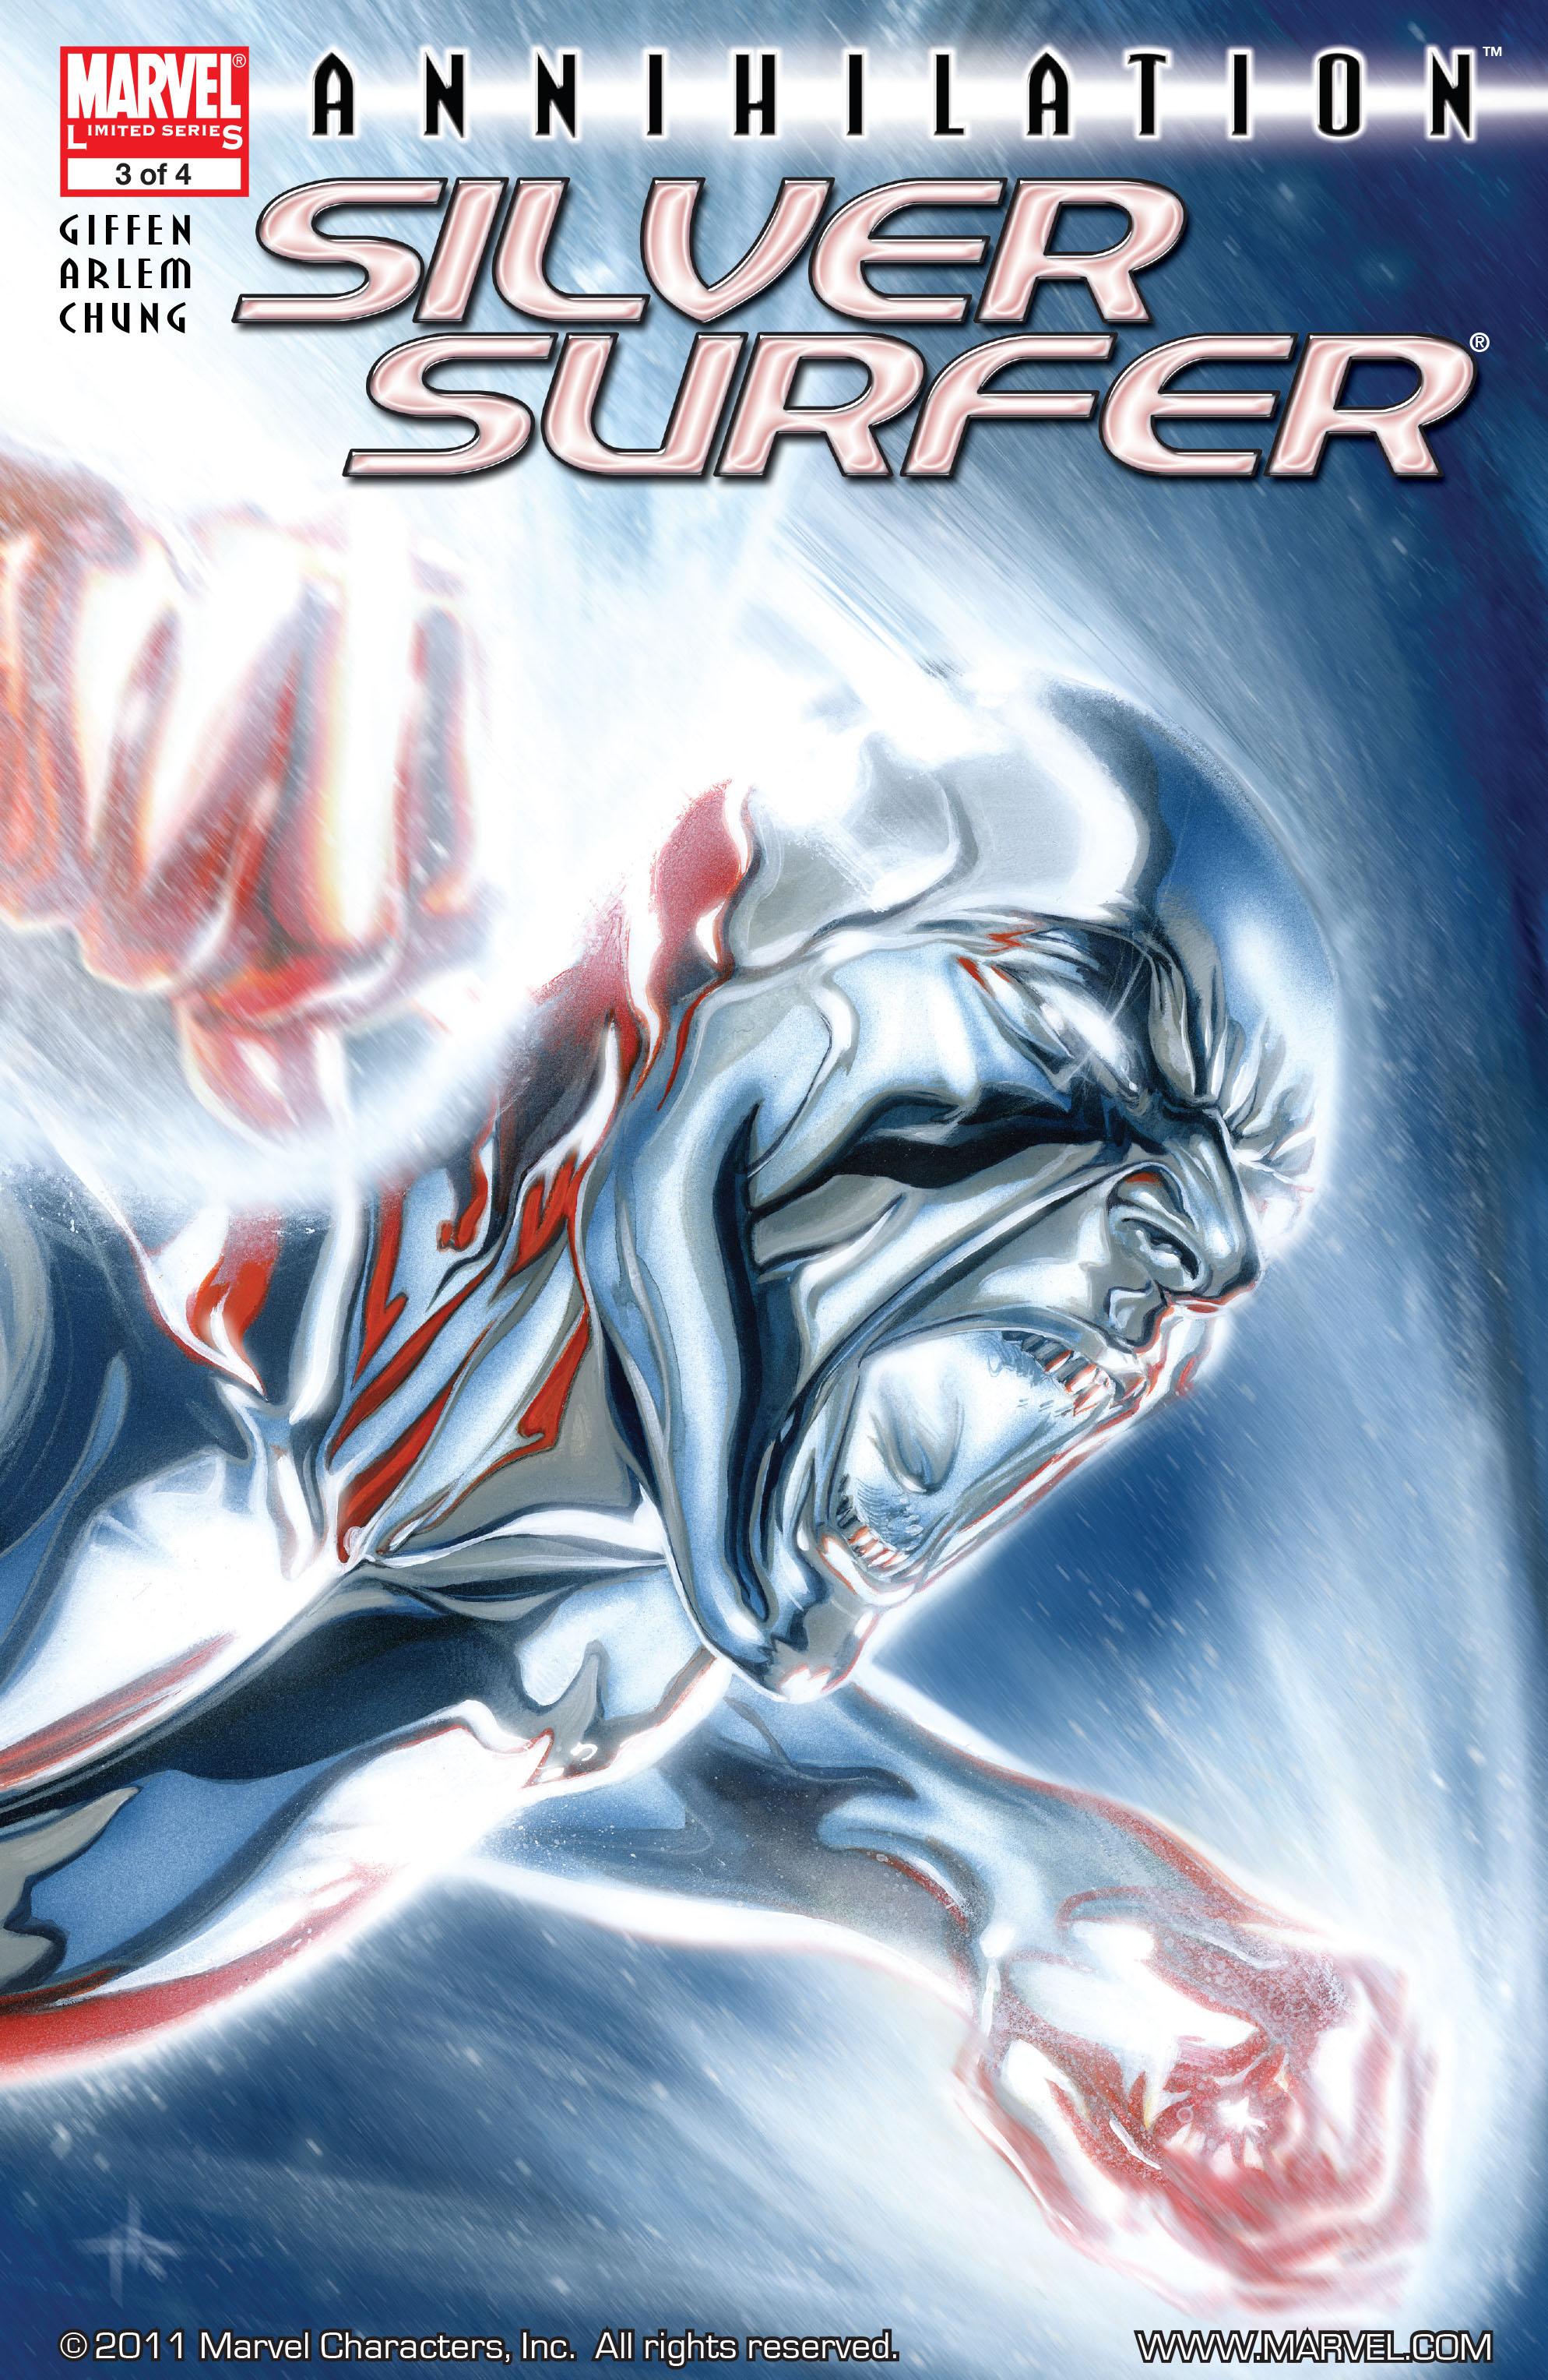 Read online Annihilation: Silver Surfer comic -  Issue #3 - 1